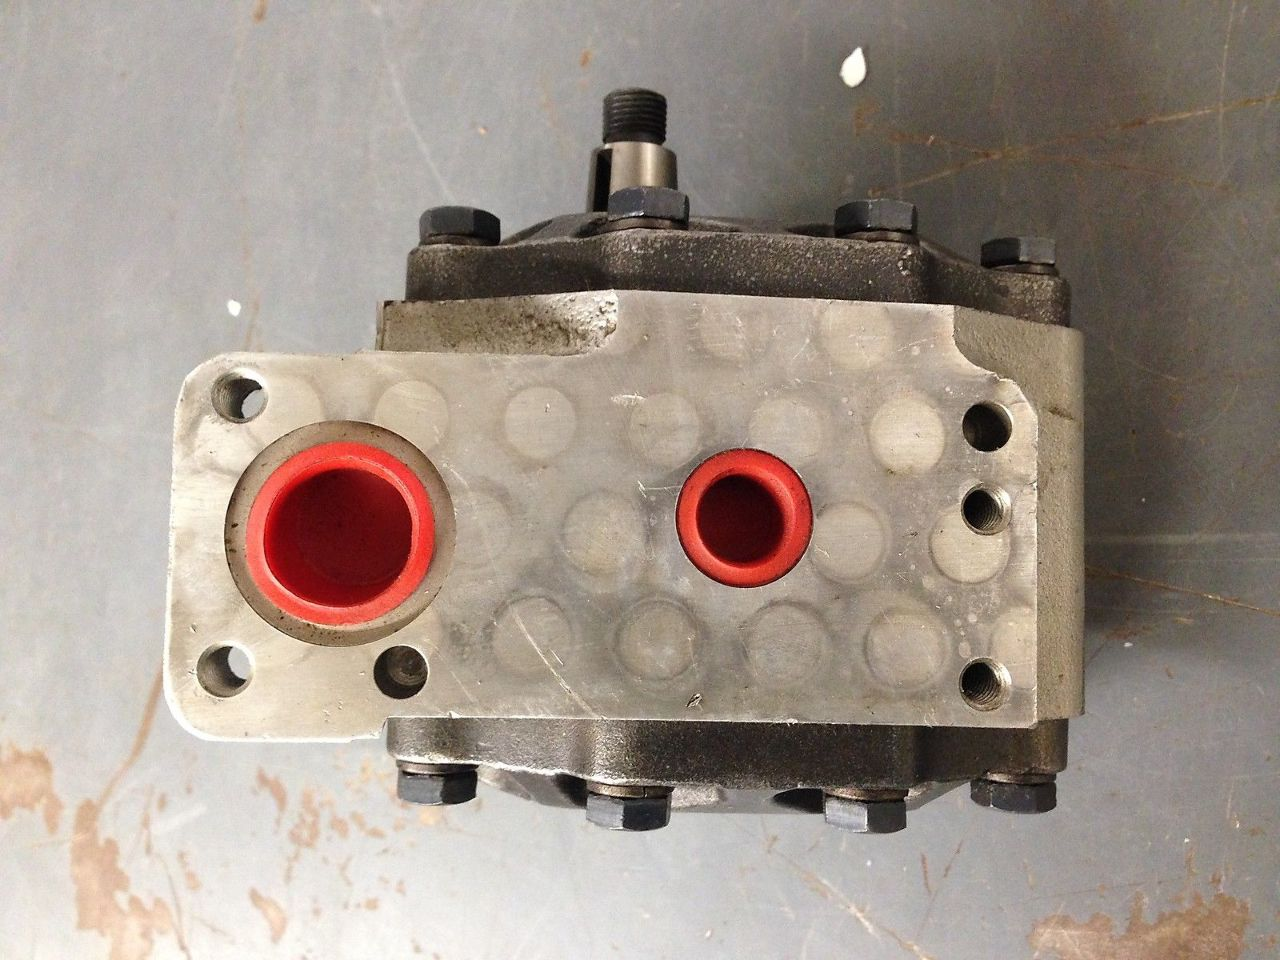 Case Garden Tractor Hydraulic Pump : Oem case ih c hydraulic gear pump s lotastock